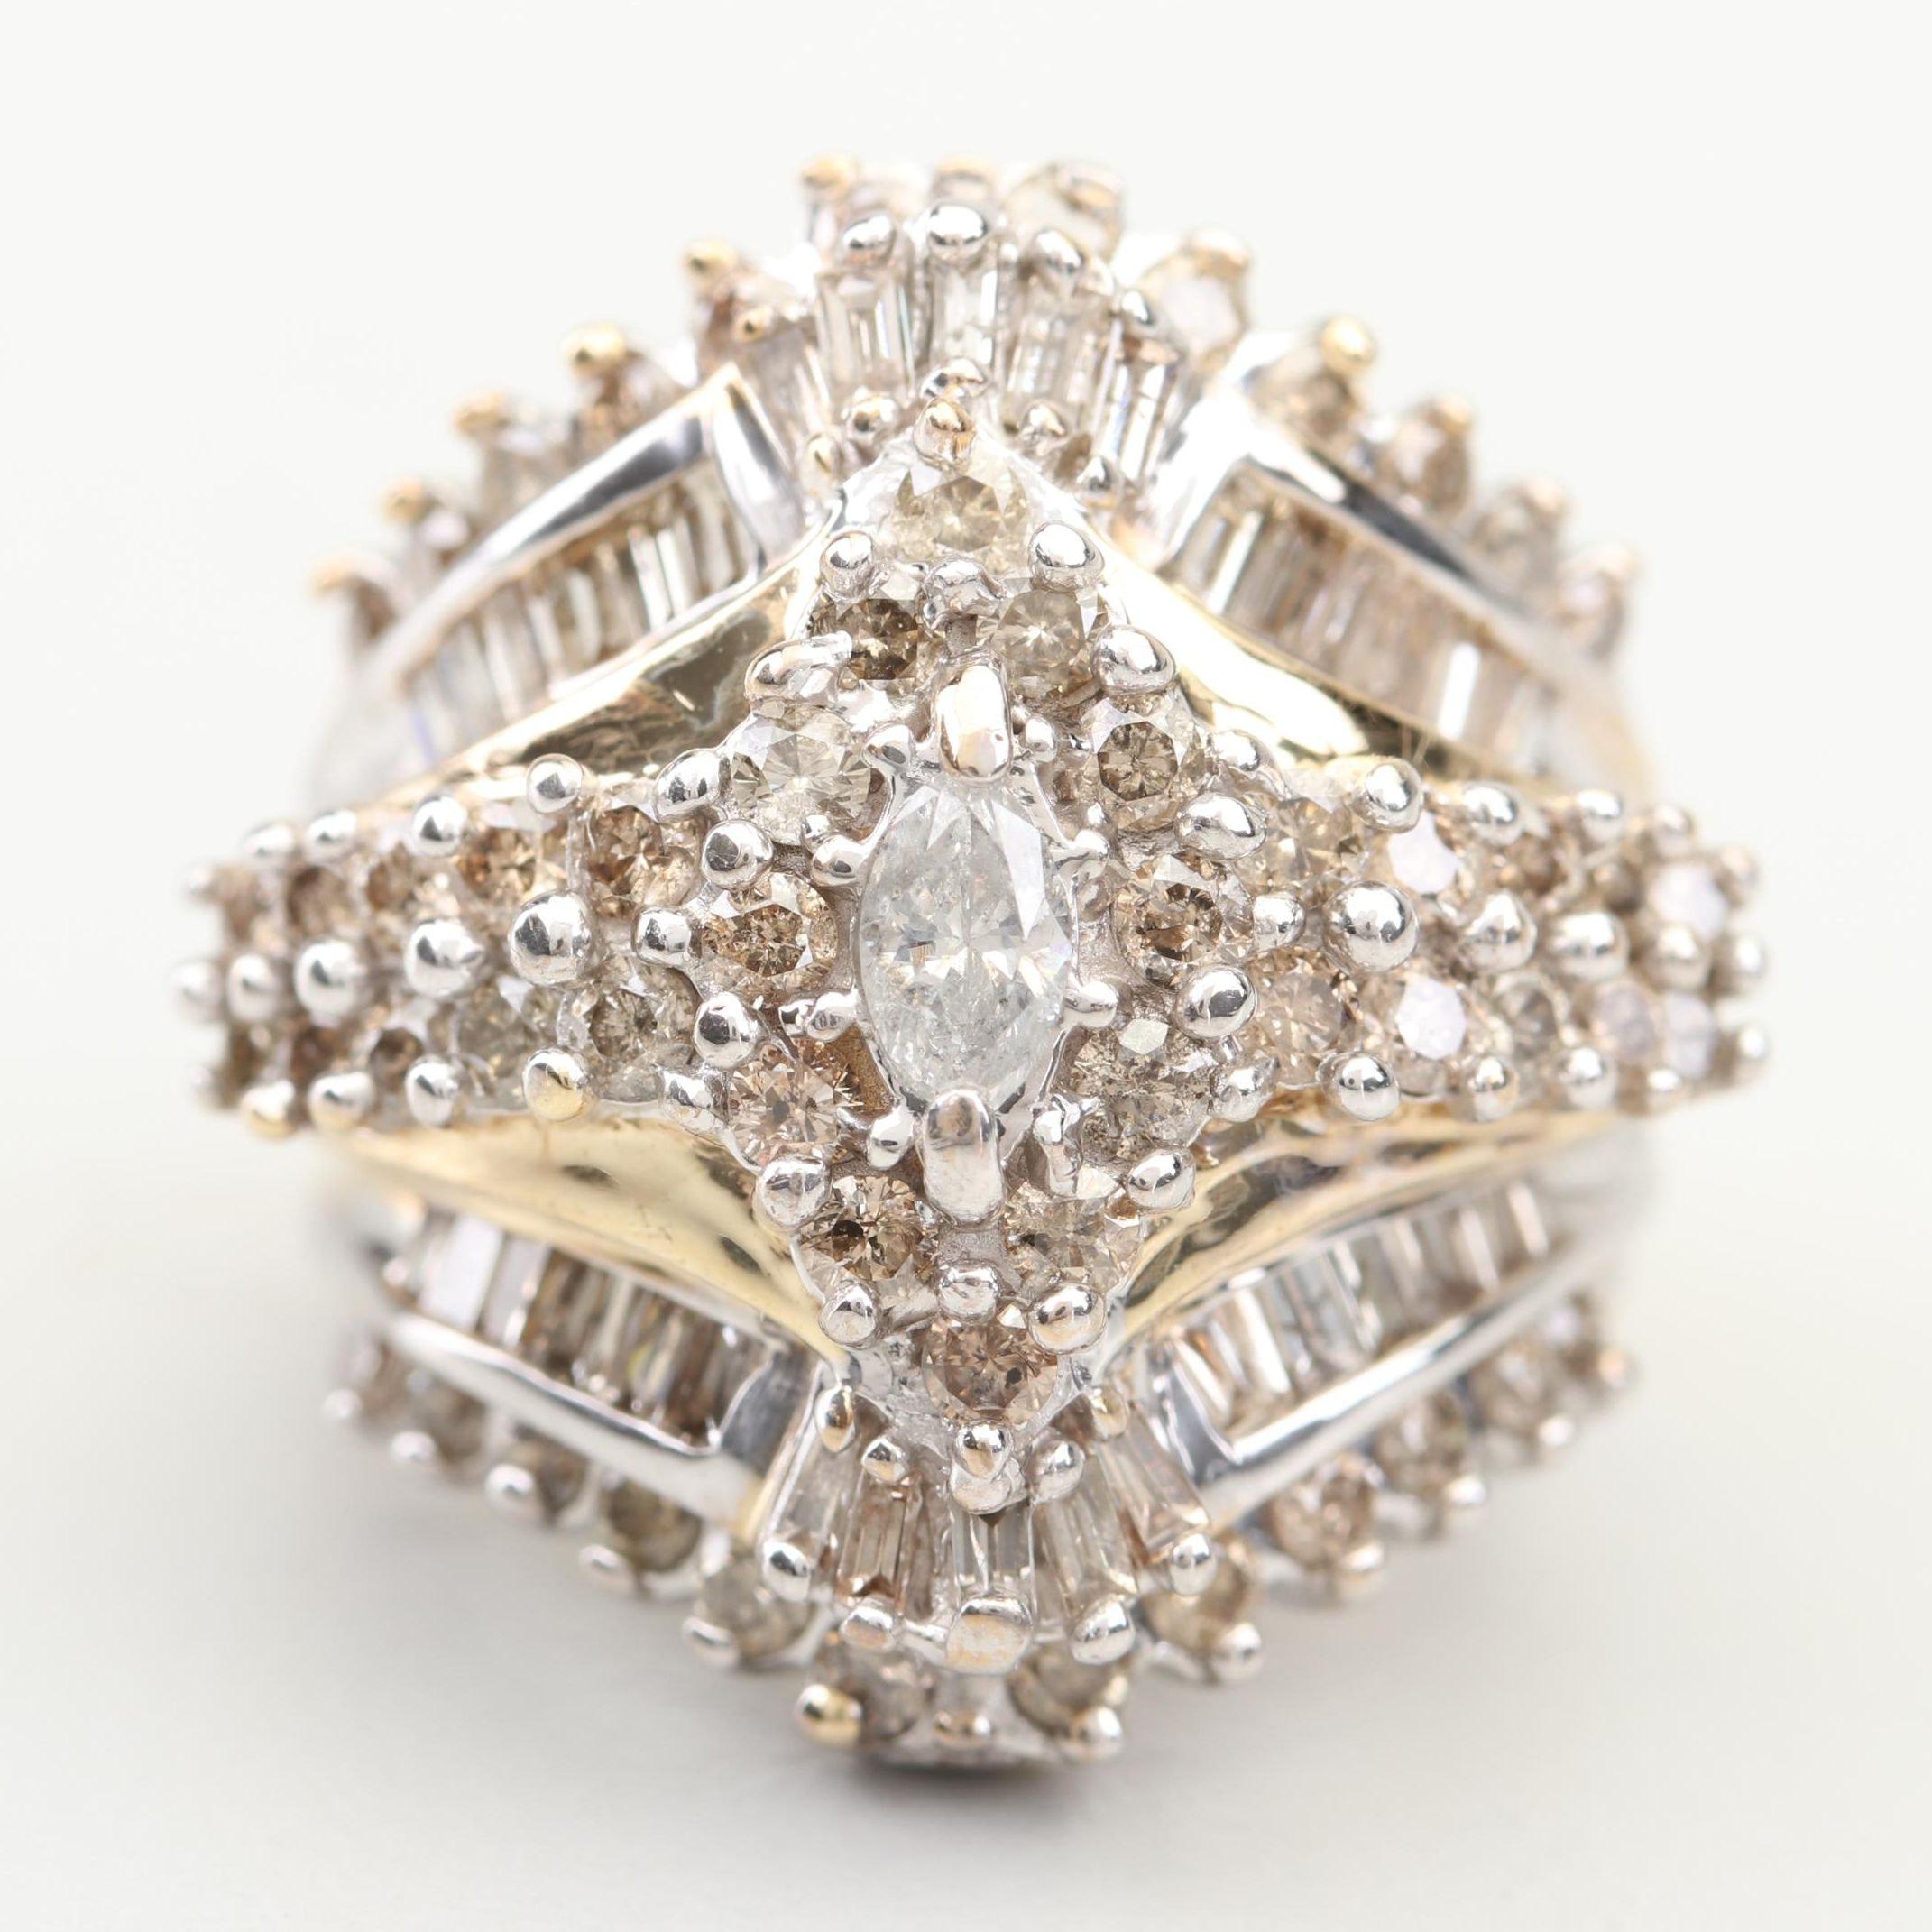 10K Yellow Gold 3.13 CTW Diamond Ring